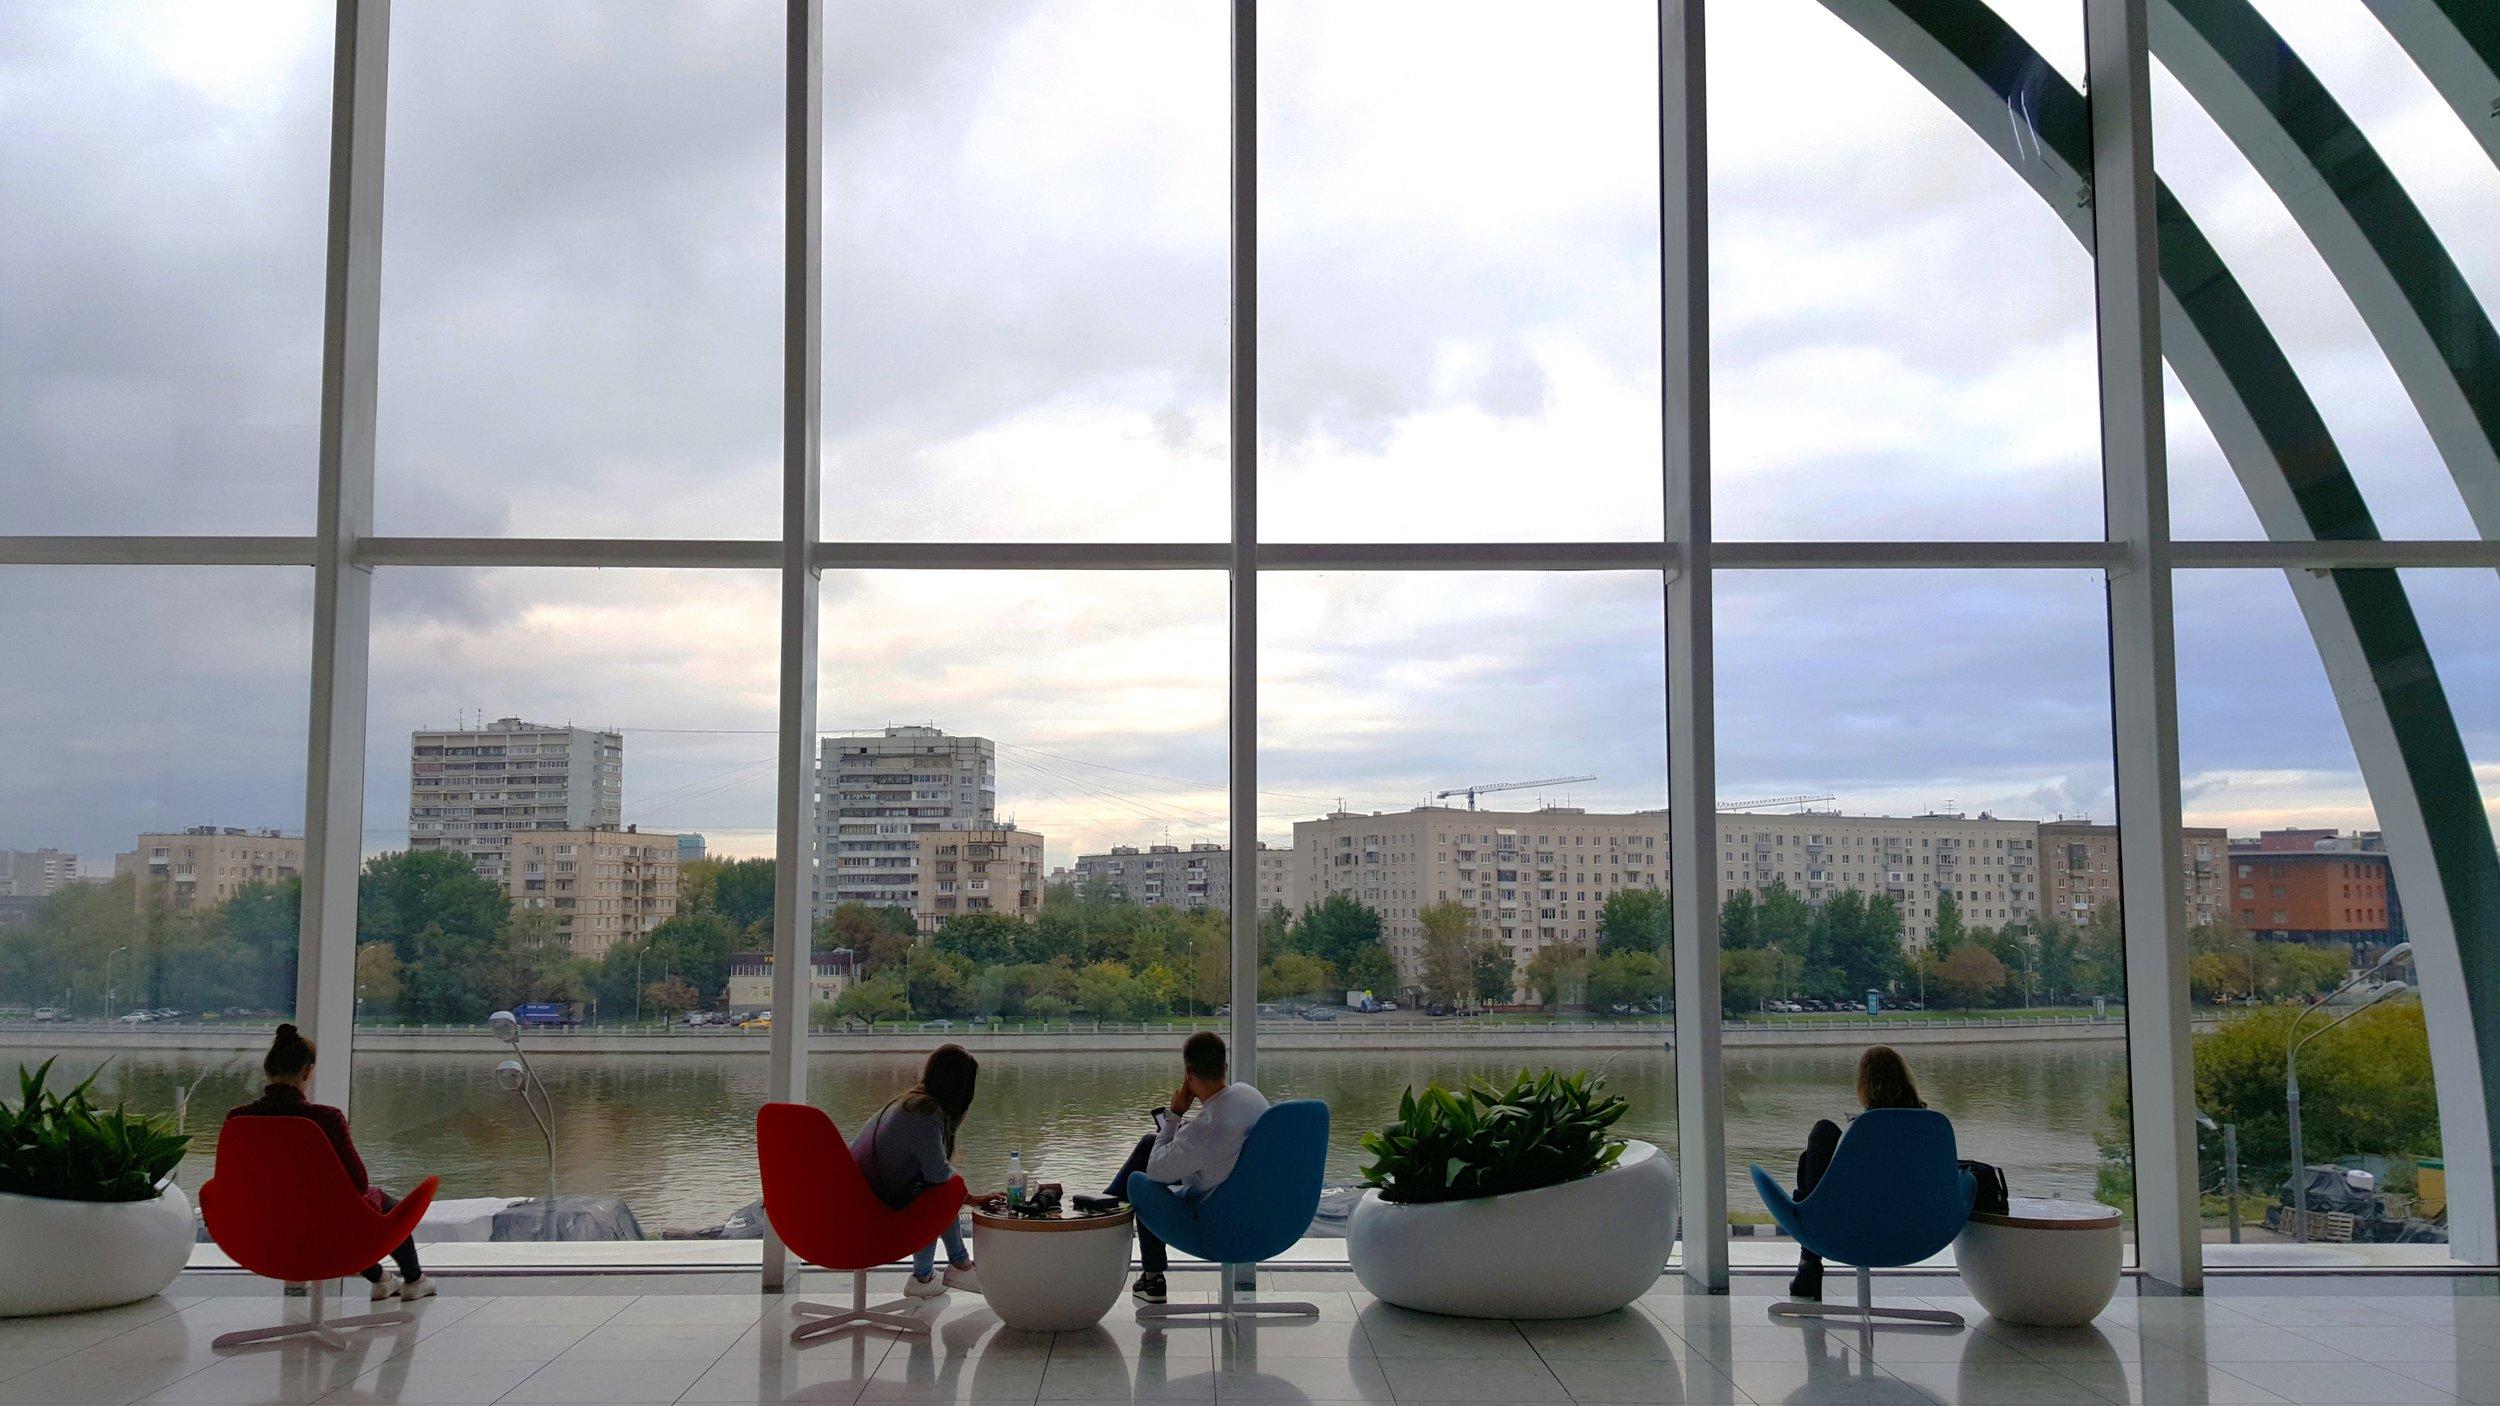 Interior River View.jpg